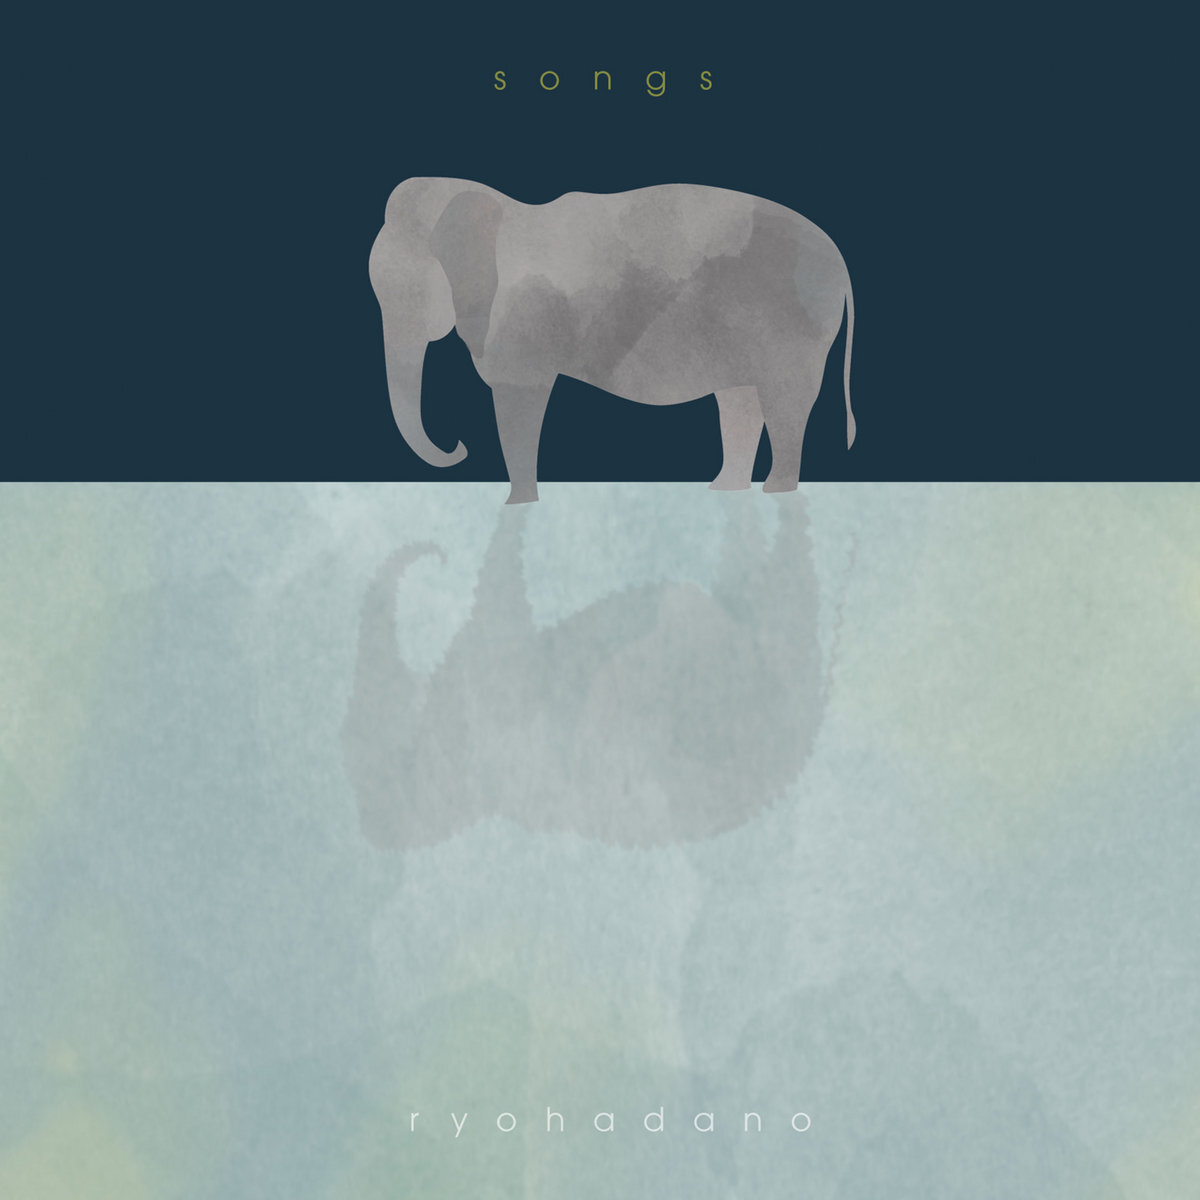 ryohadano - songs (CD)